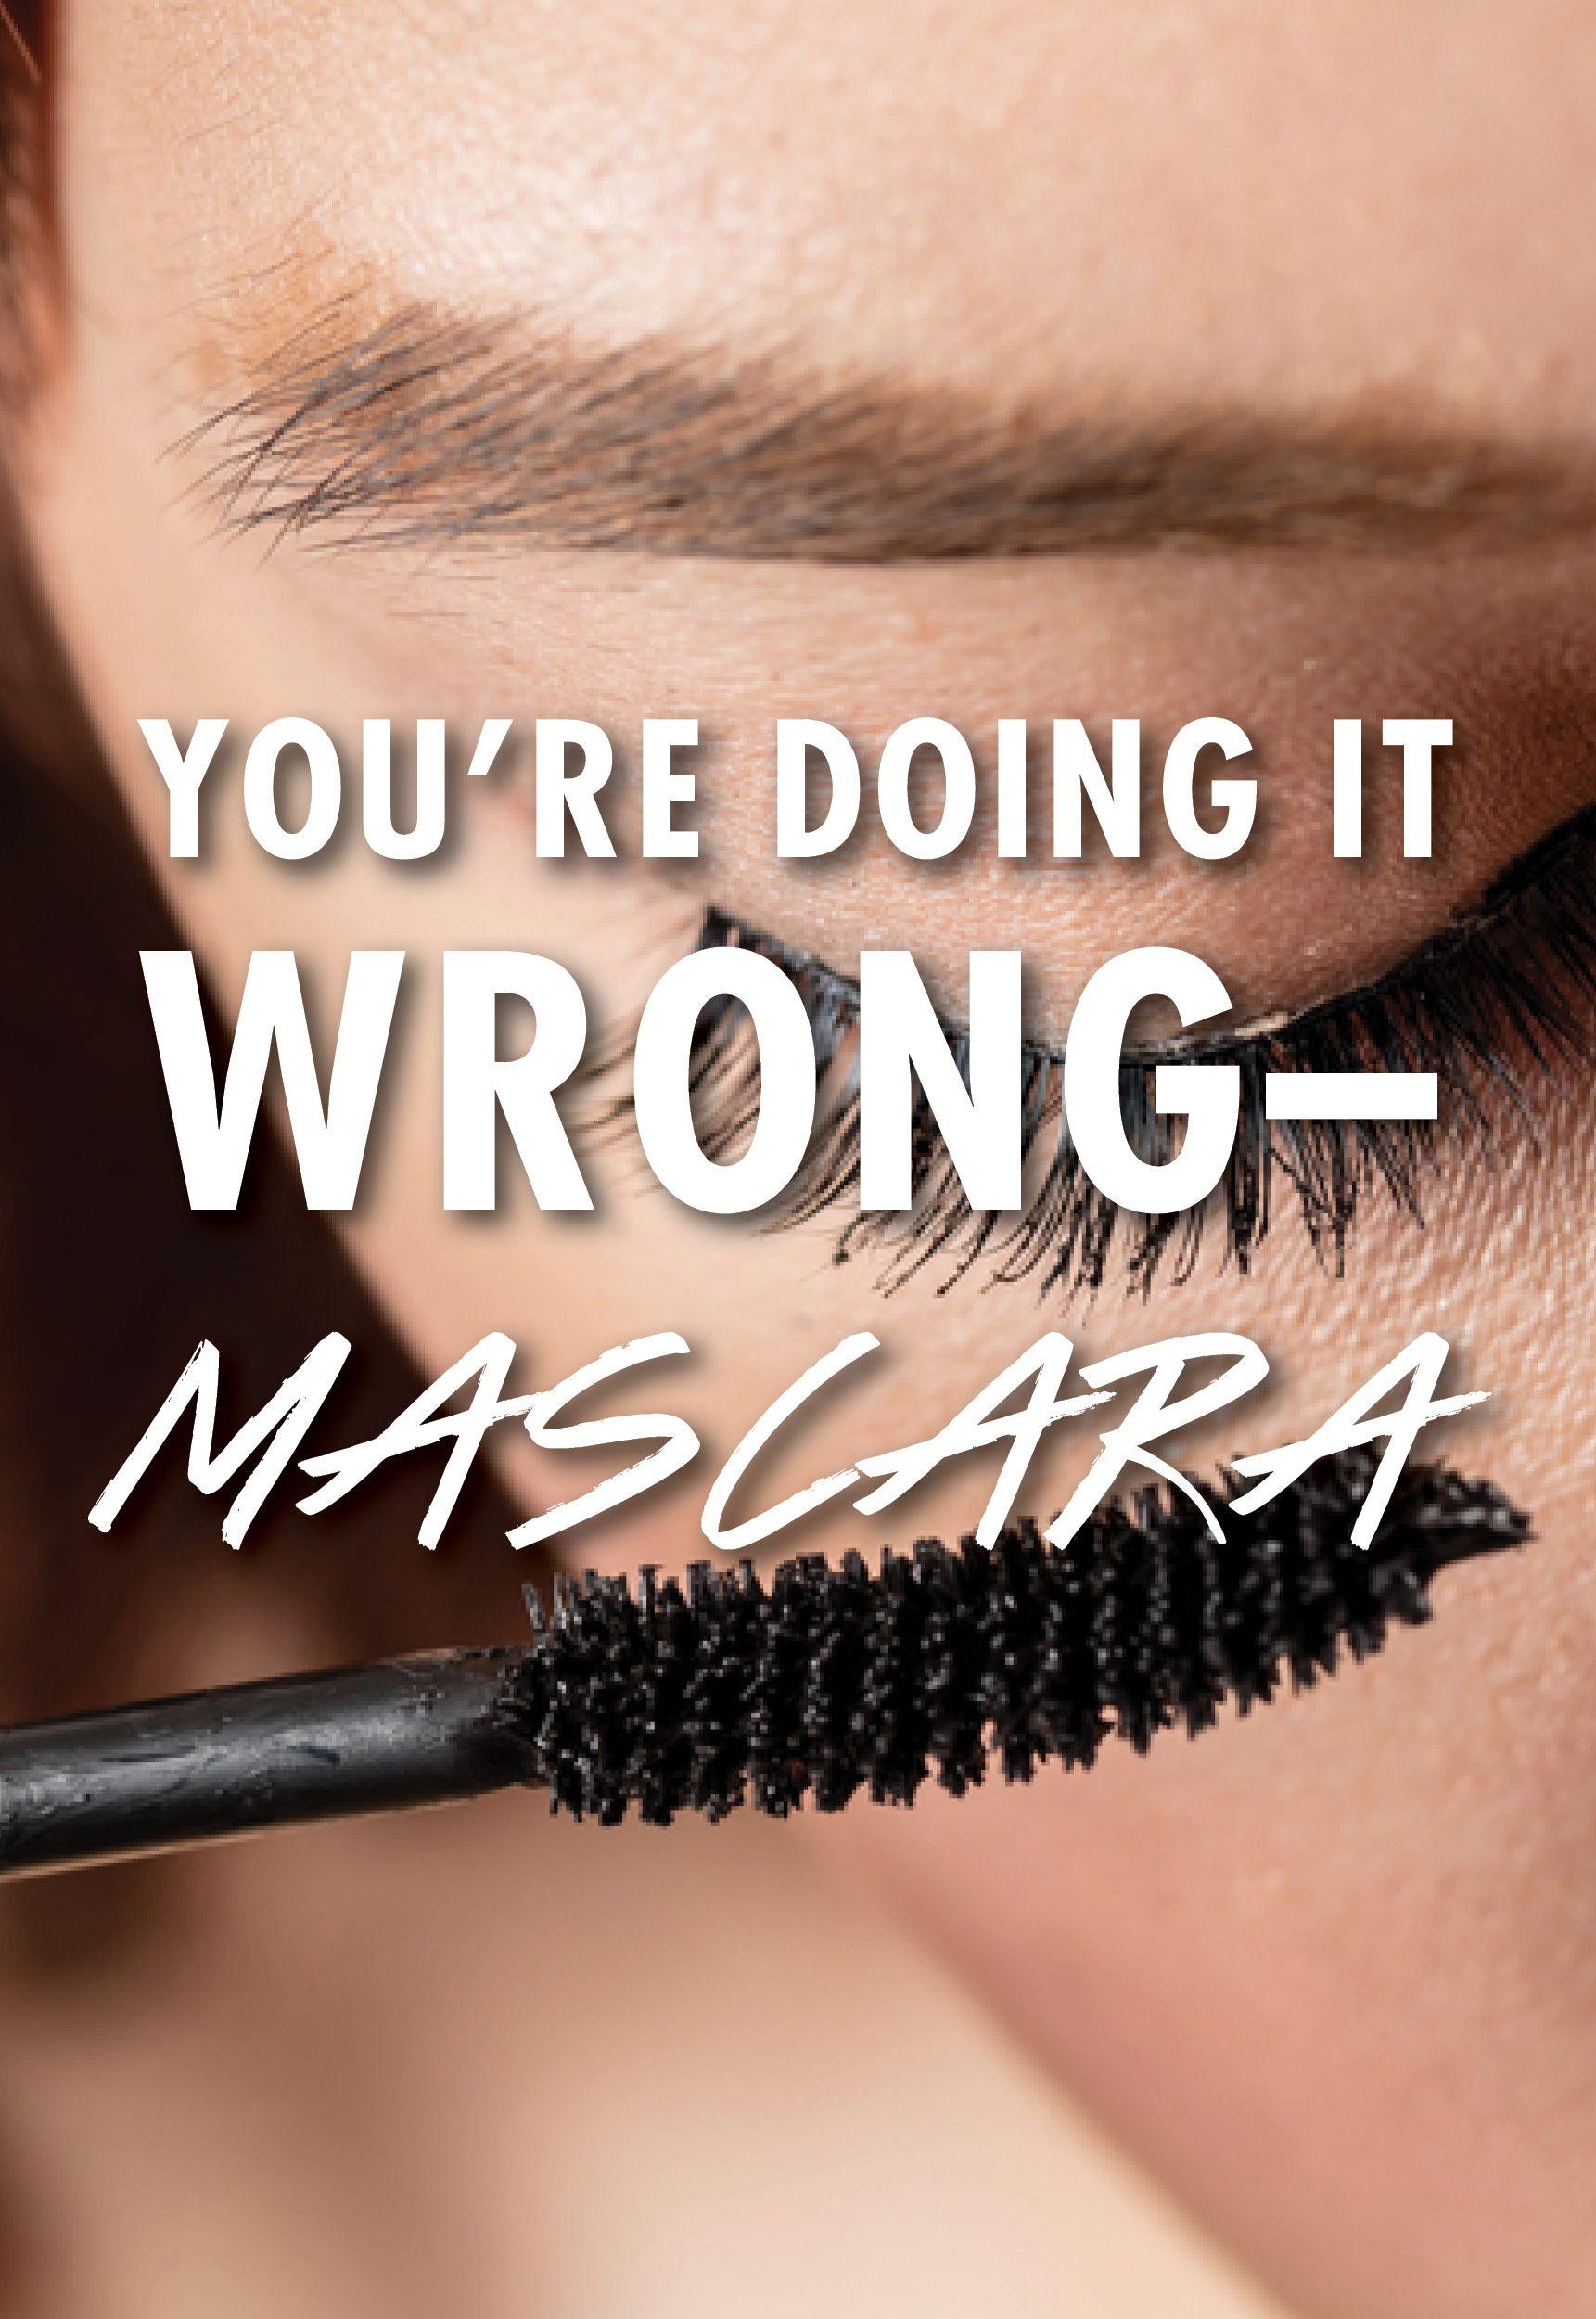 How To Apply Mascara How to apply mascara, Mascara tips